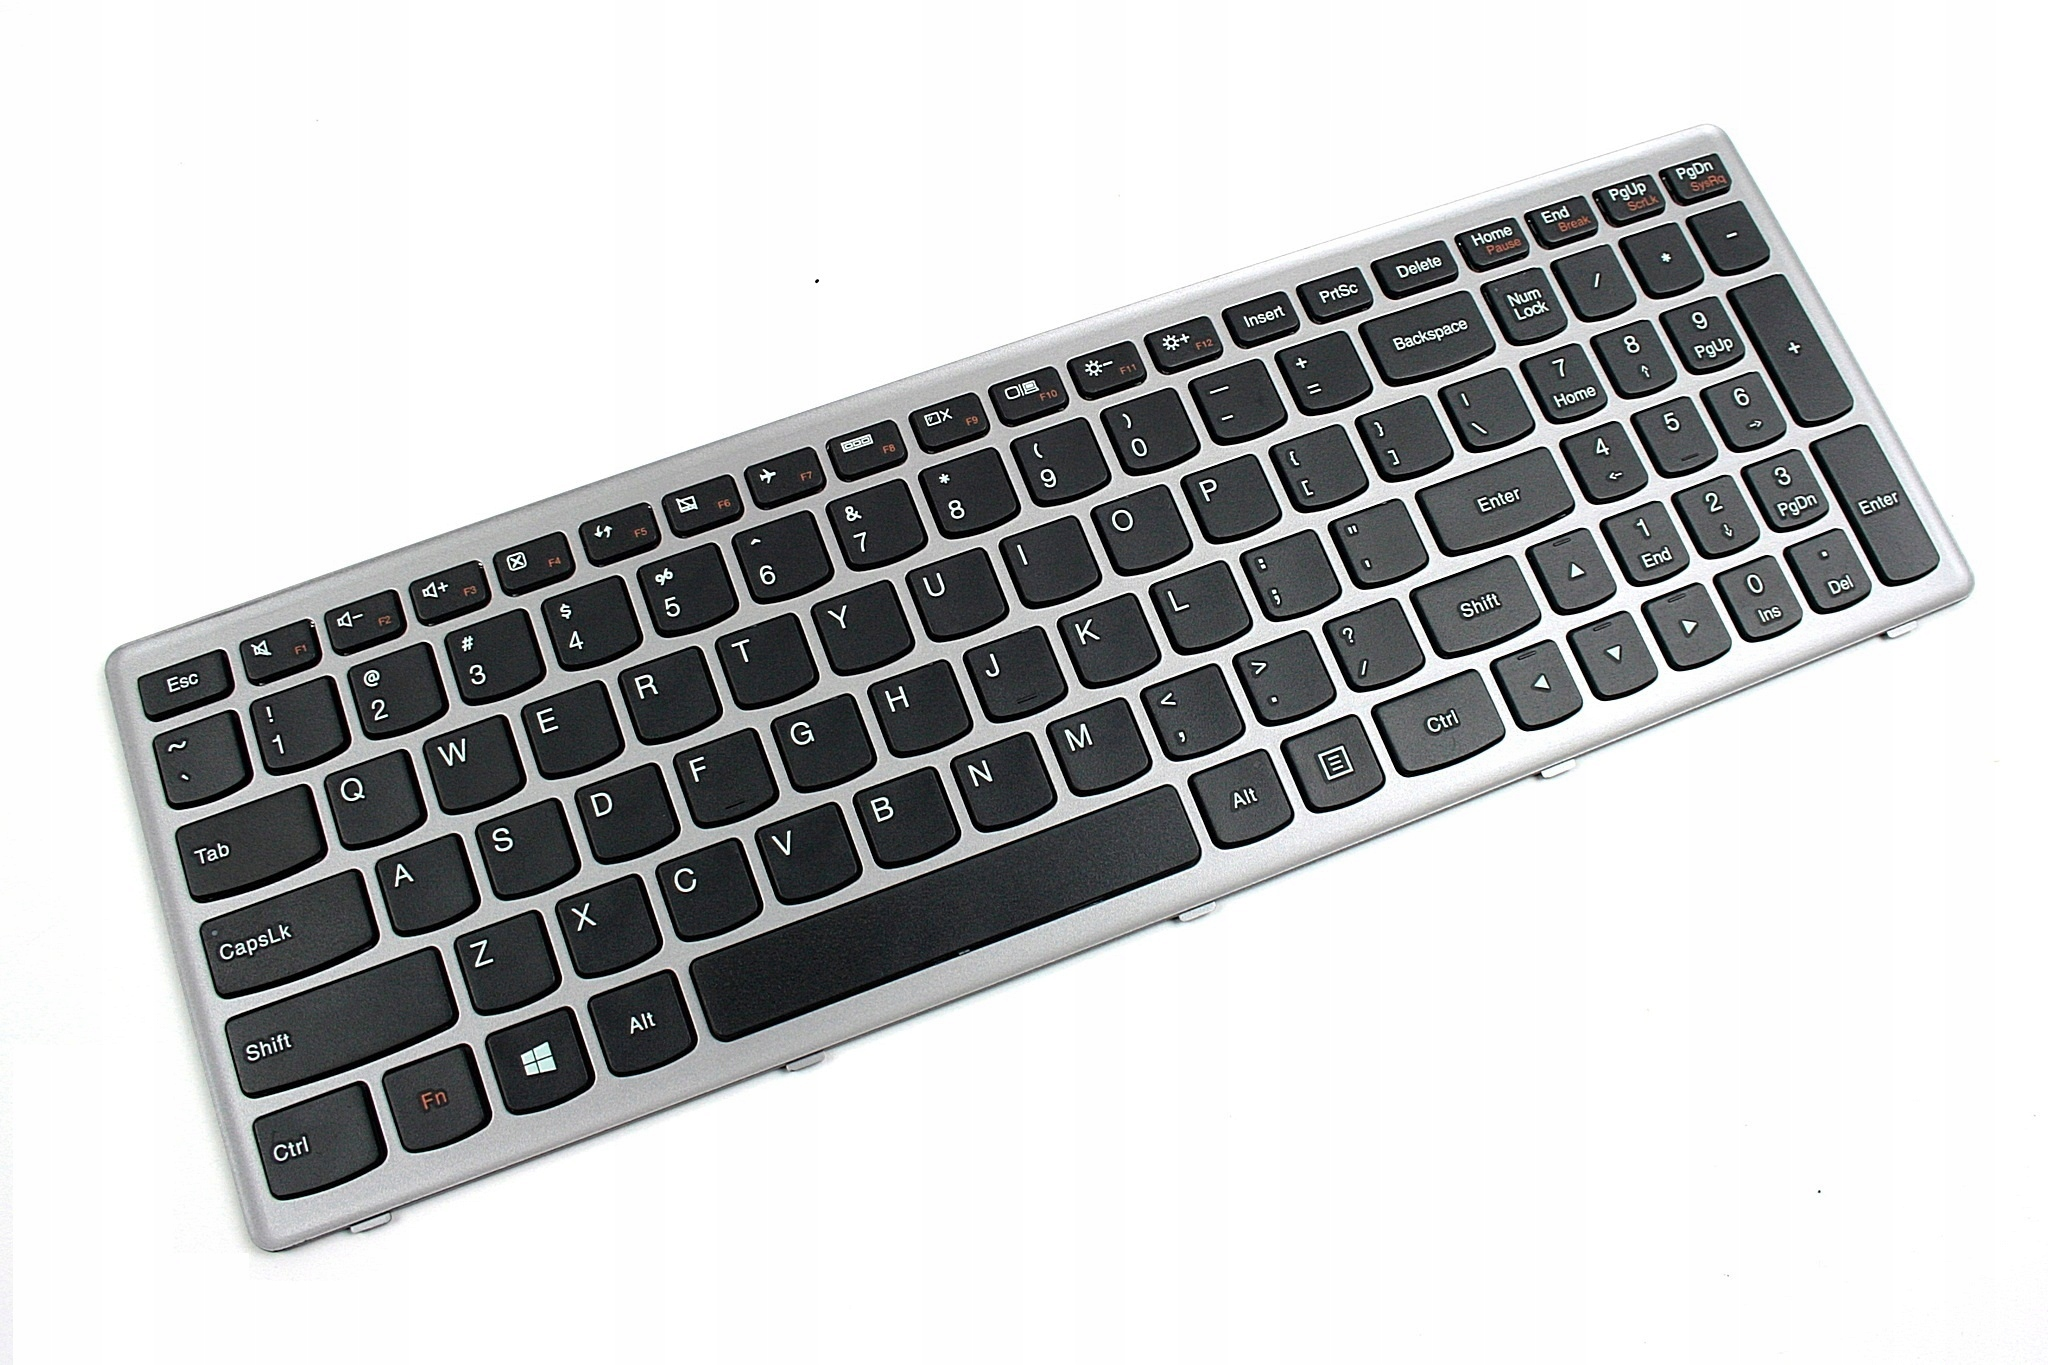 KLAWIATURA IBM LENOVO Z500 T6F1-US 25206237 BF4SC - Klawiatury do laptopów